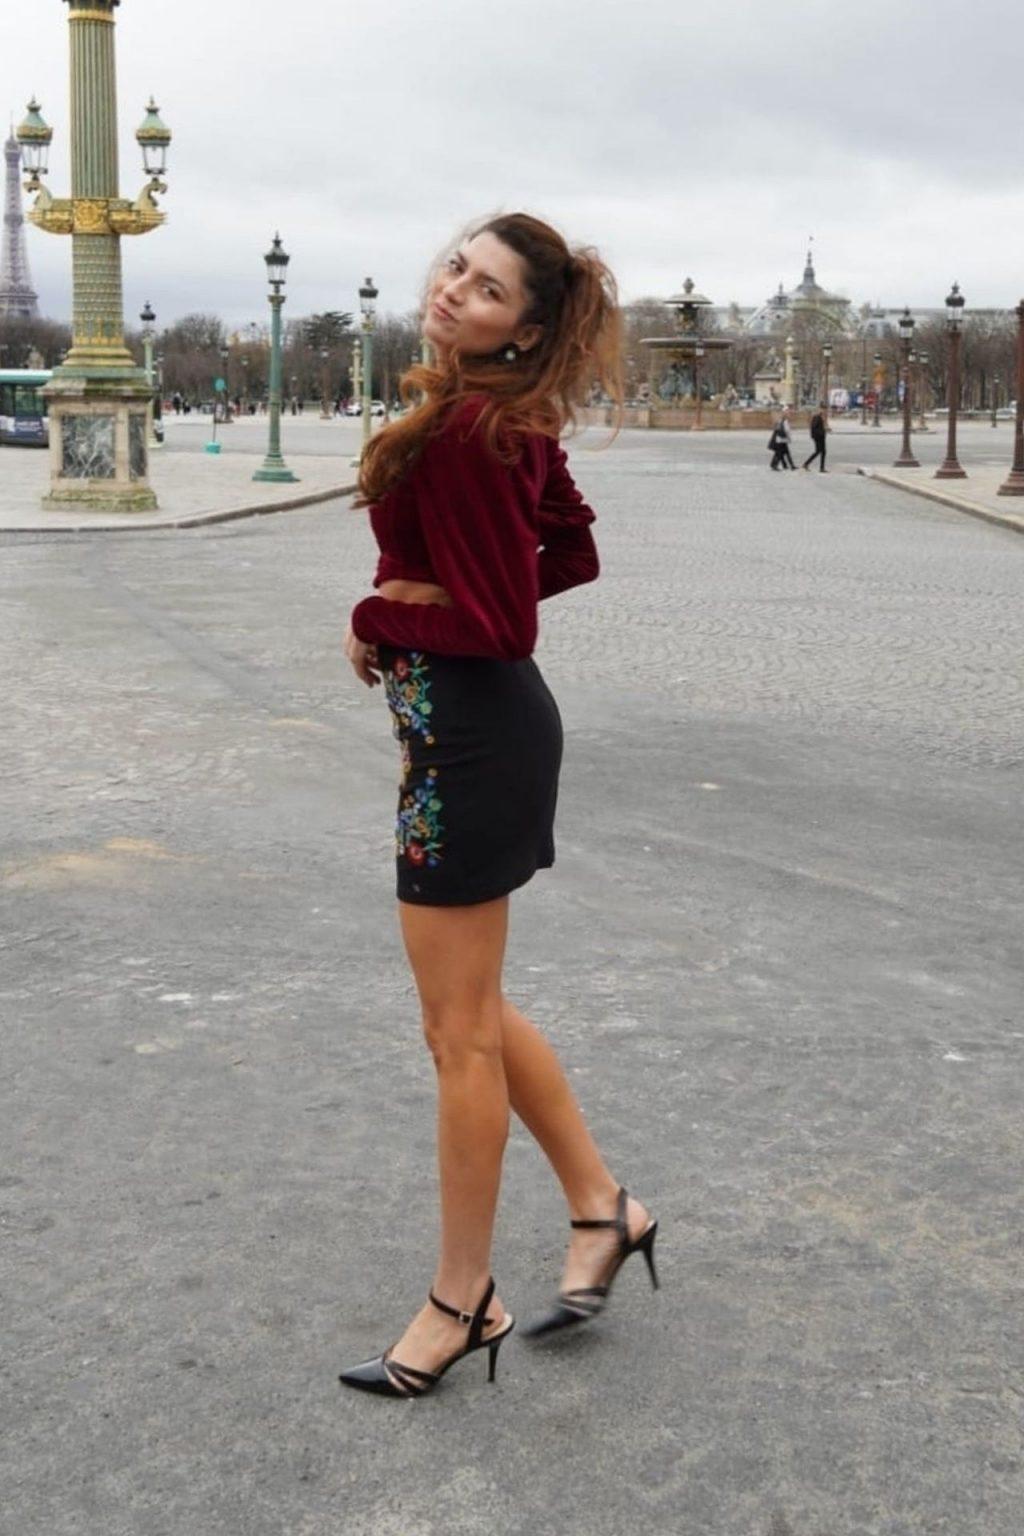 Blanca Blanco Poses on the Streets of Paris (41 Photos)